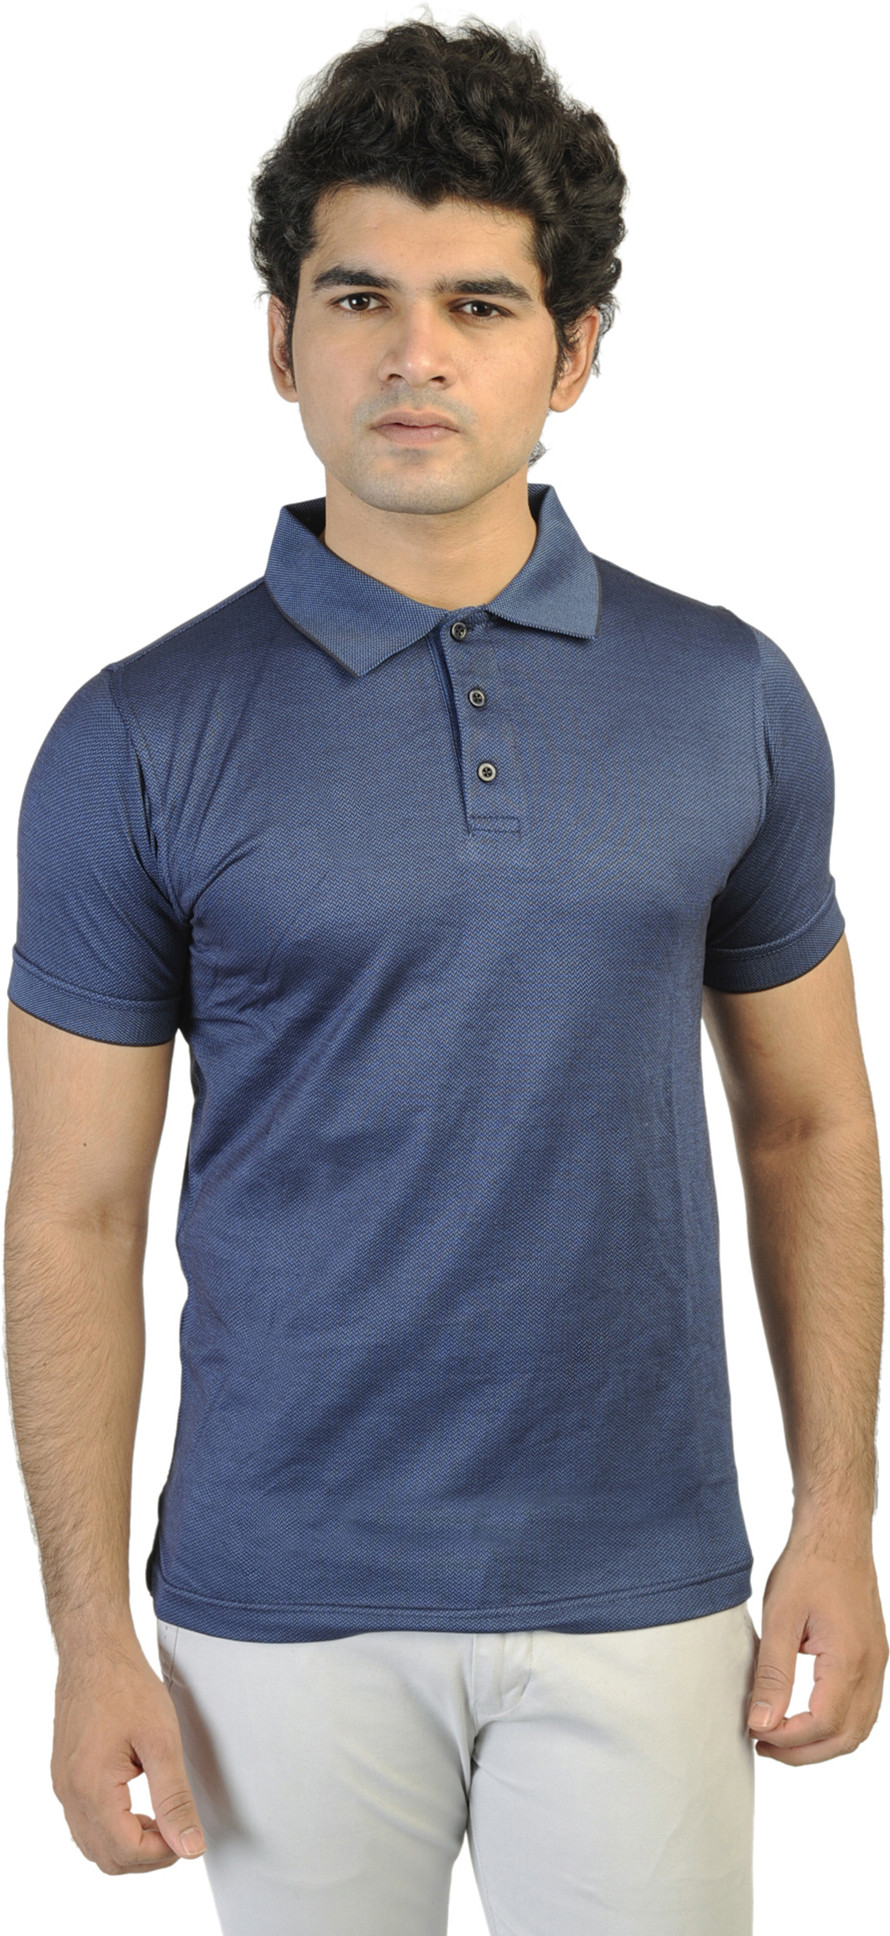 T10 Sports Printed Mens Polo Neck Blue T-Shirt